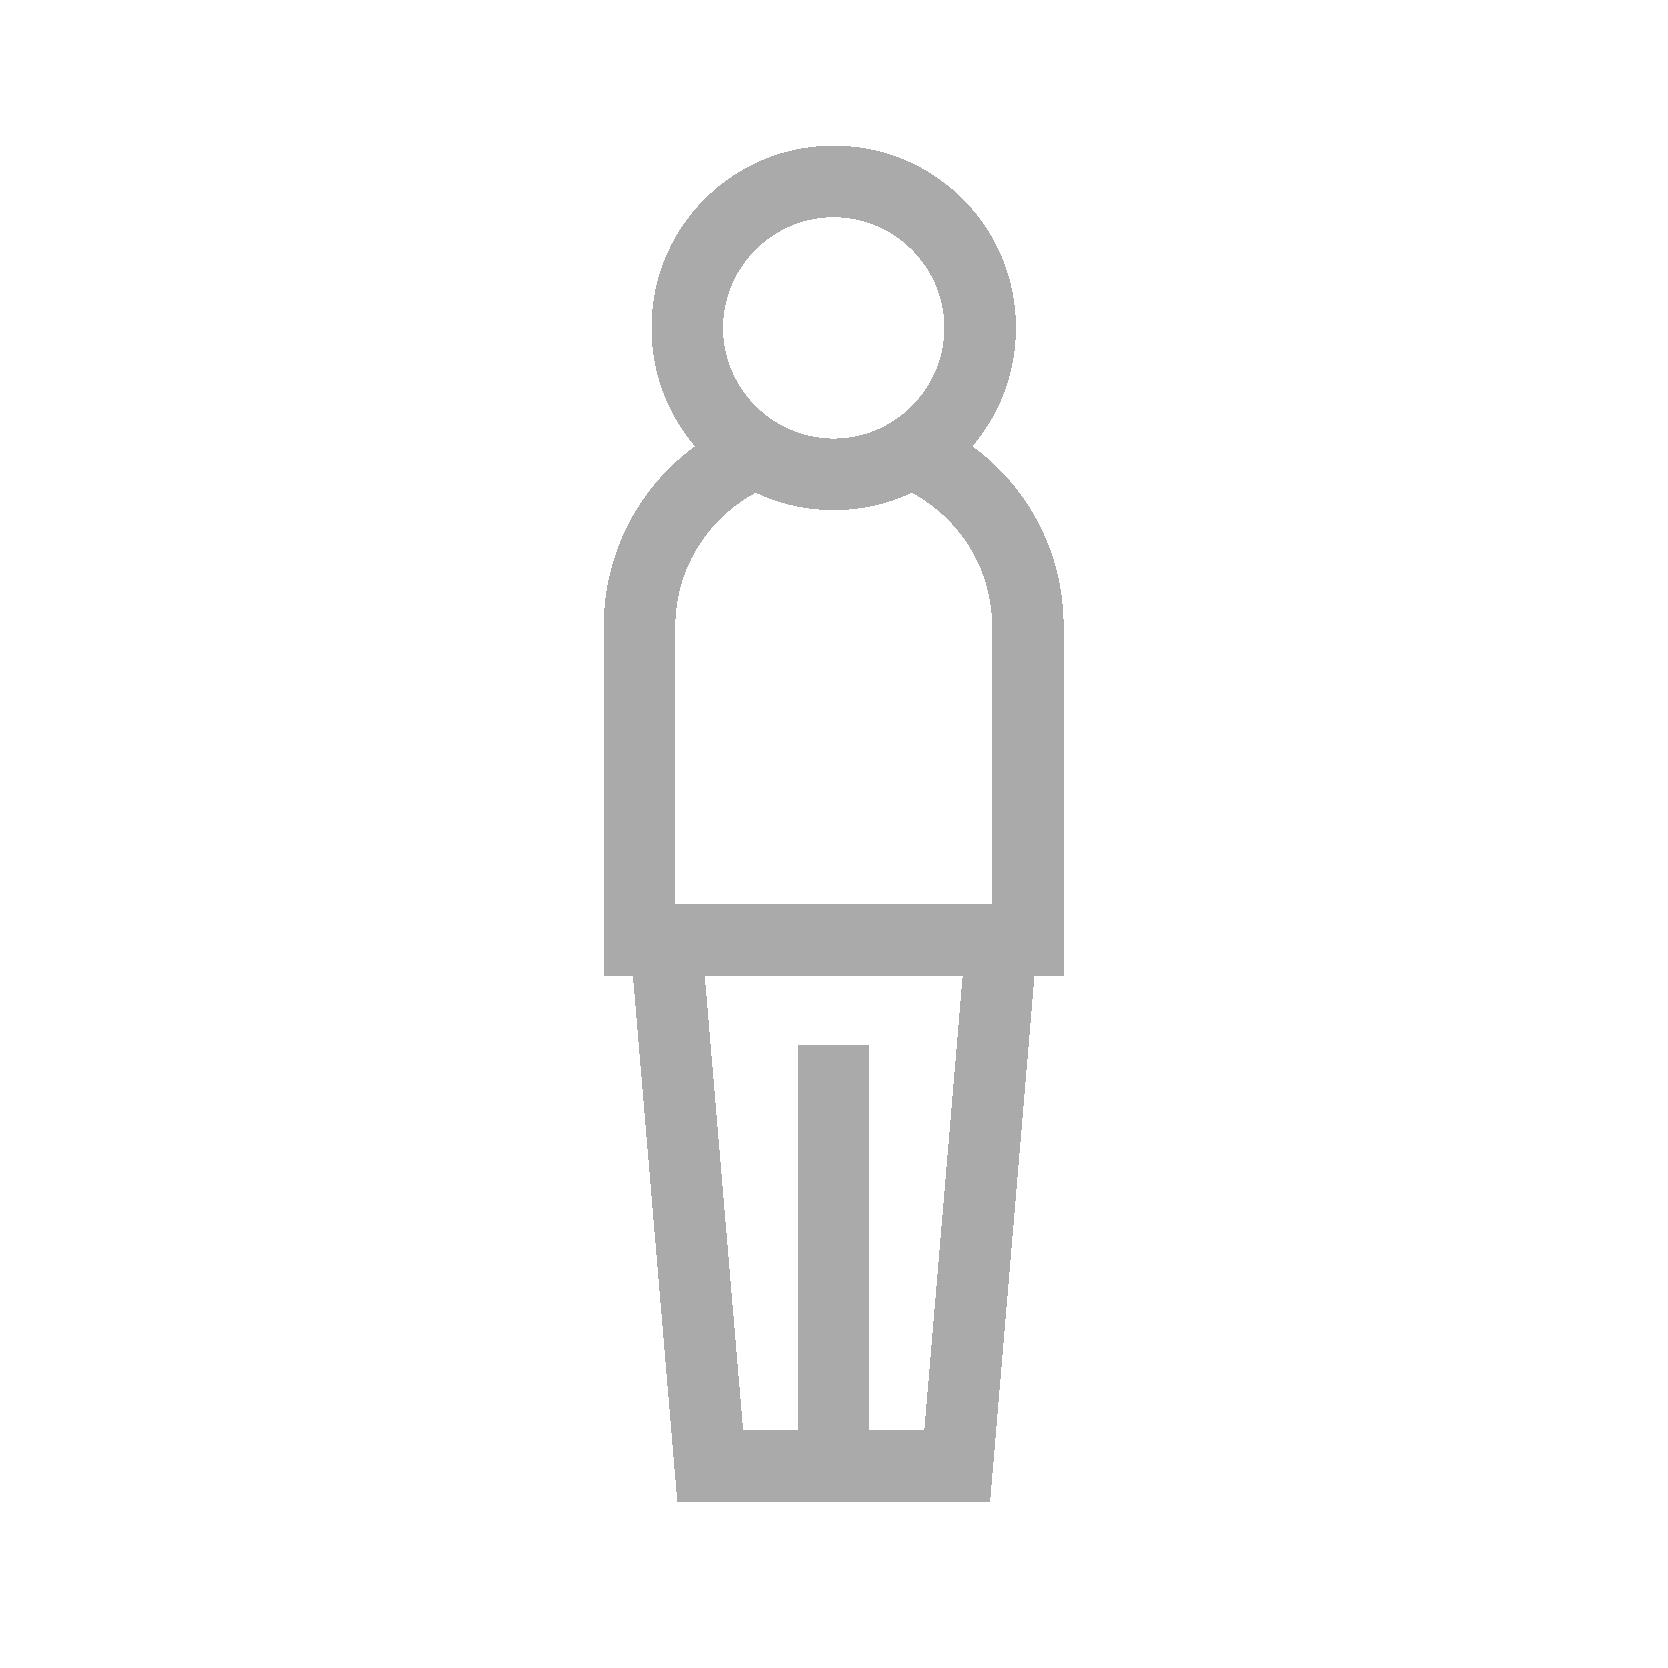 icon-individuals